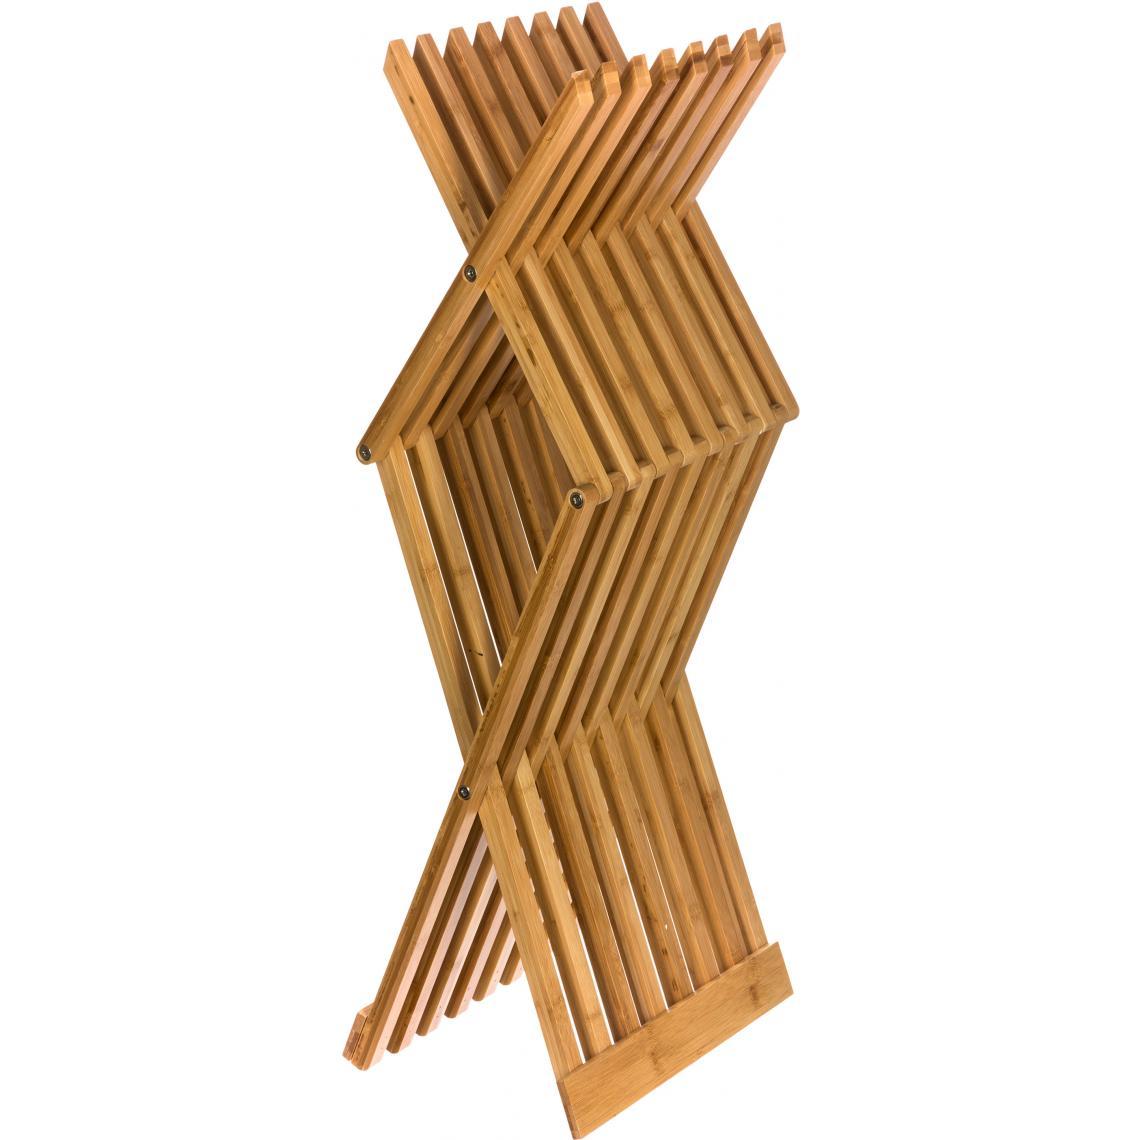 Tabouret Pliant En Bambou Beige Celine 3 Suisses